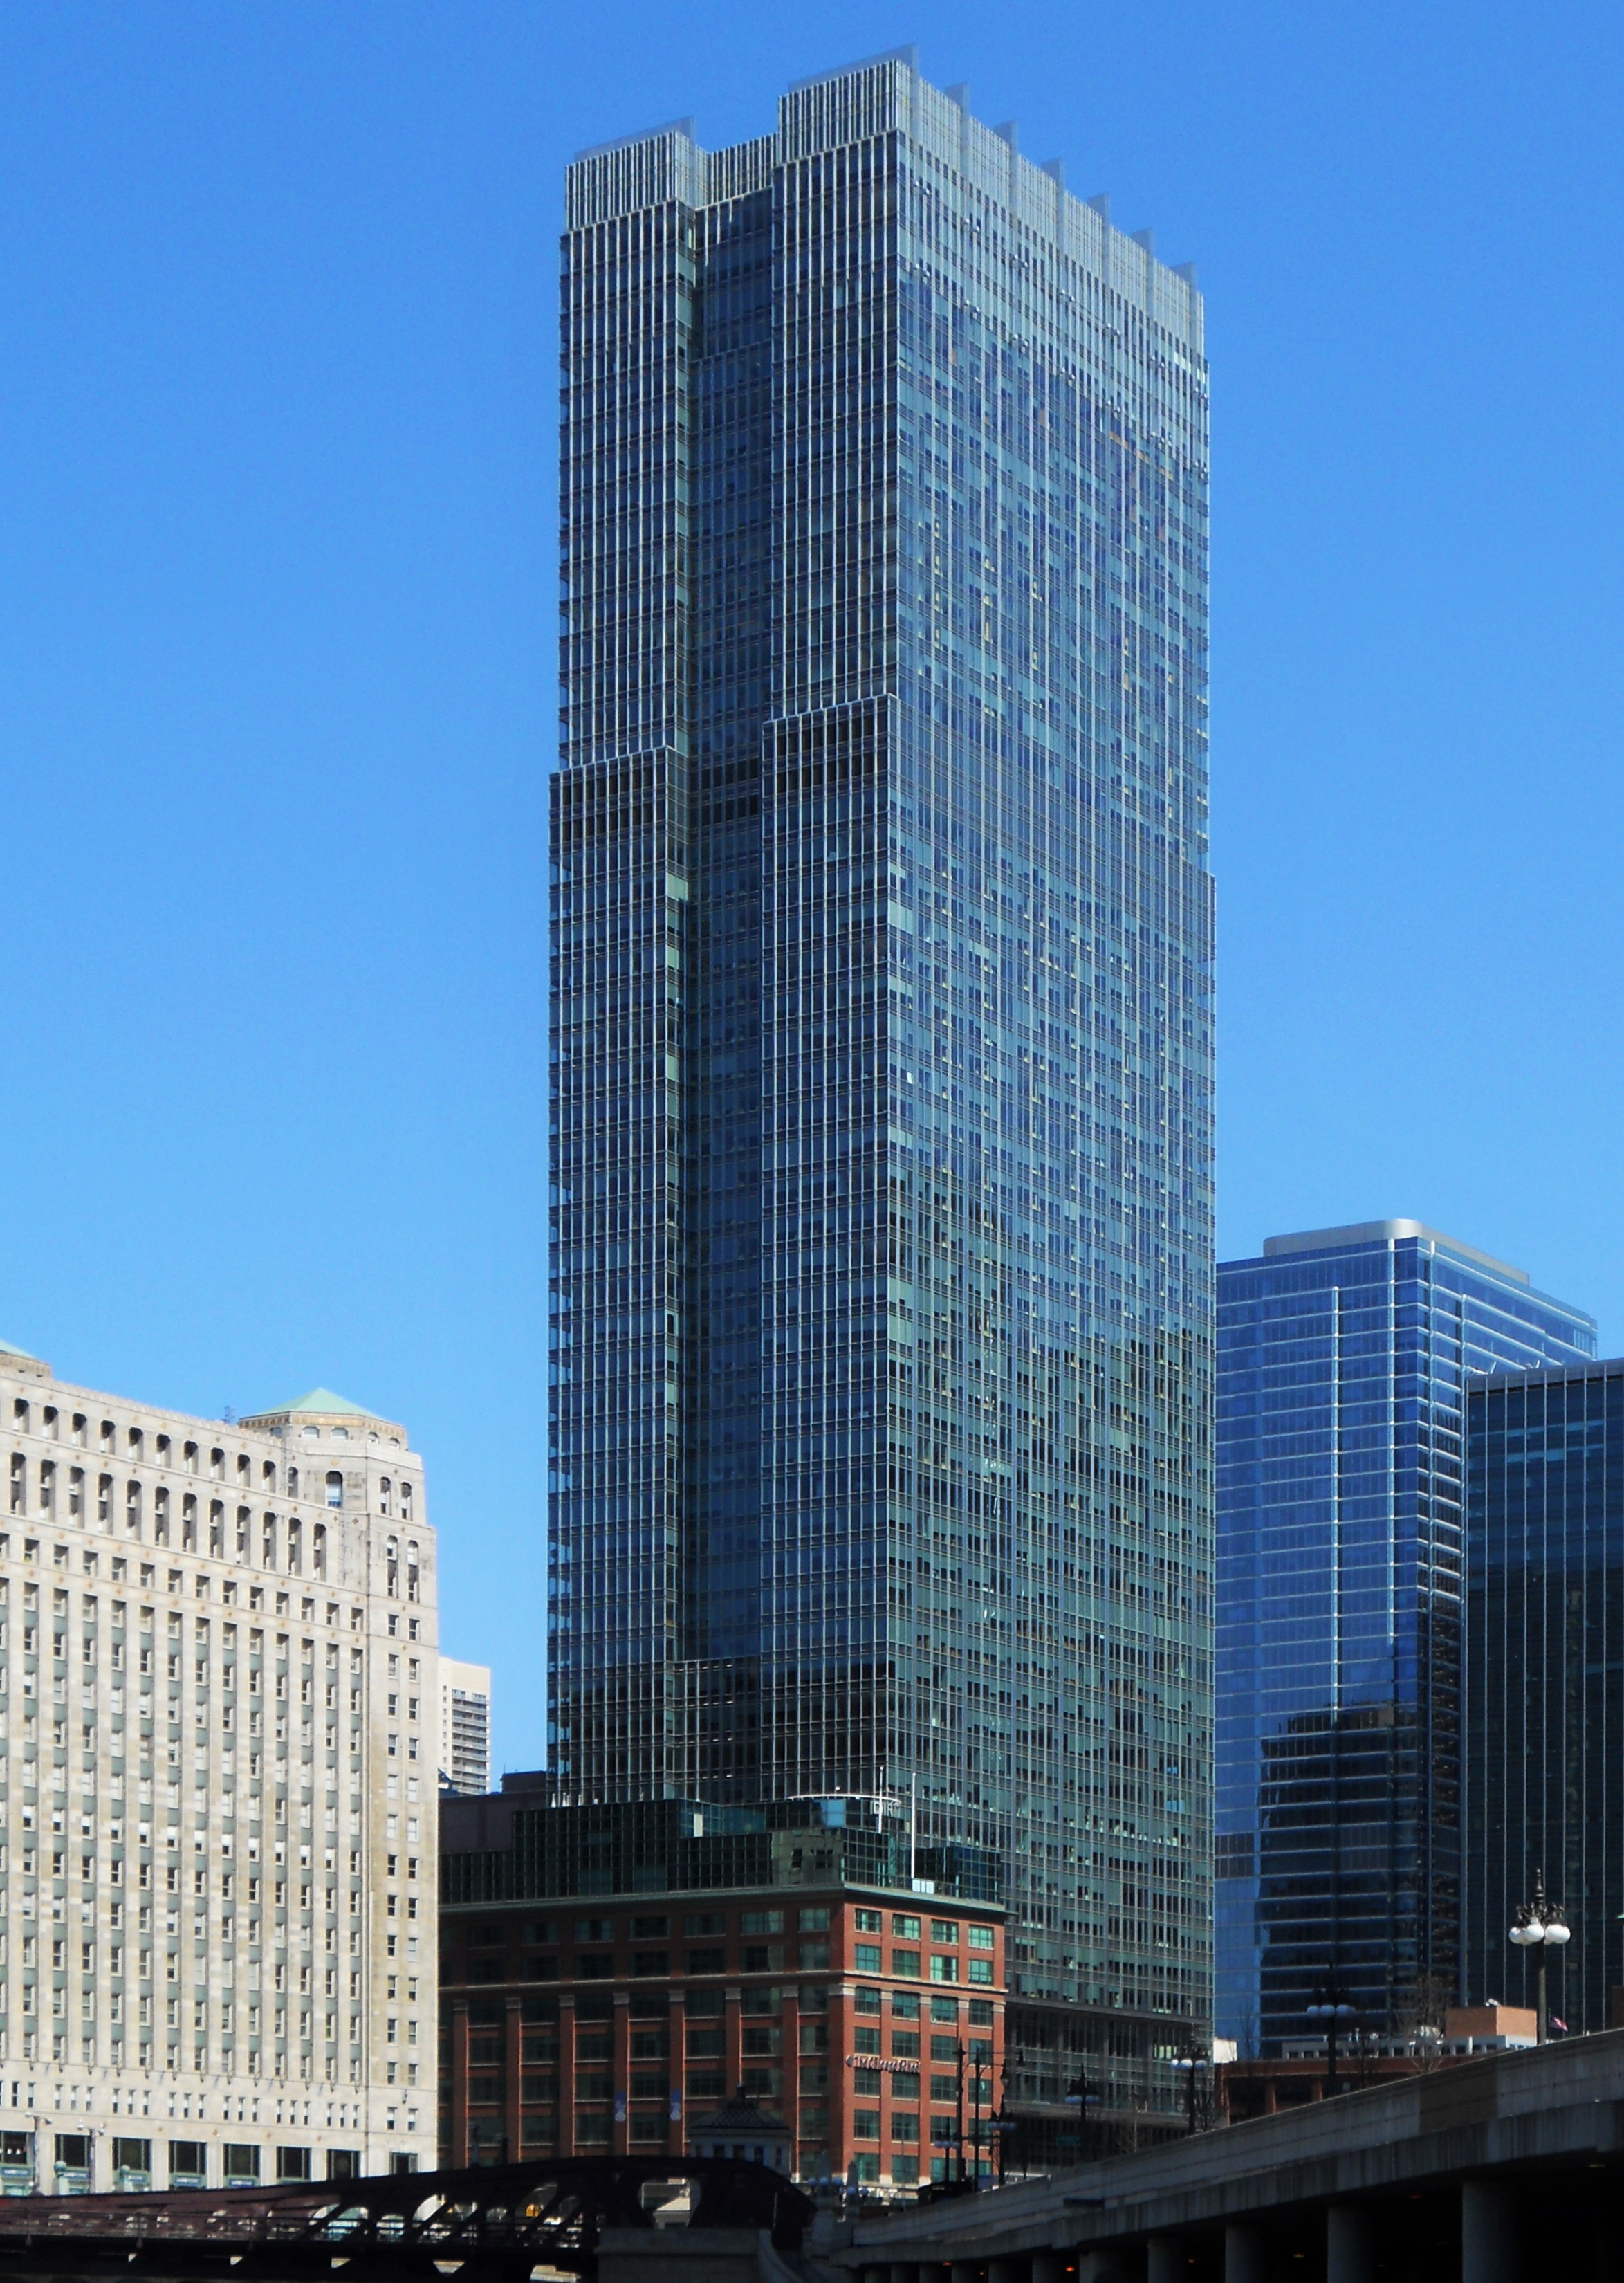 300 North LaSalle, Kirkland's Chicago headquarters